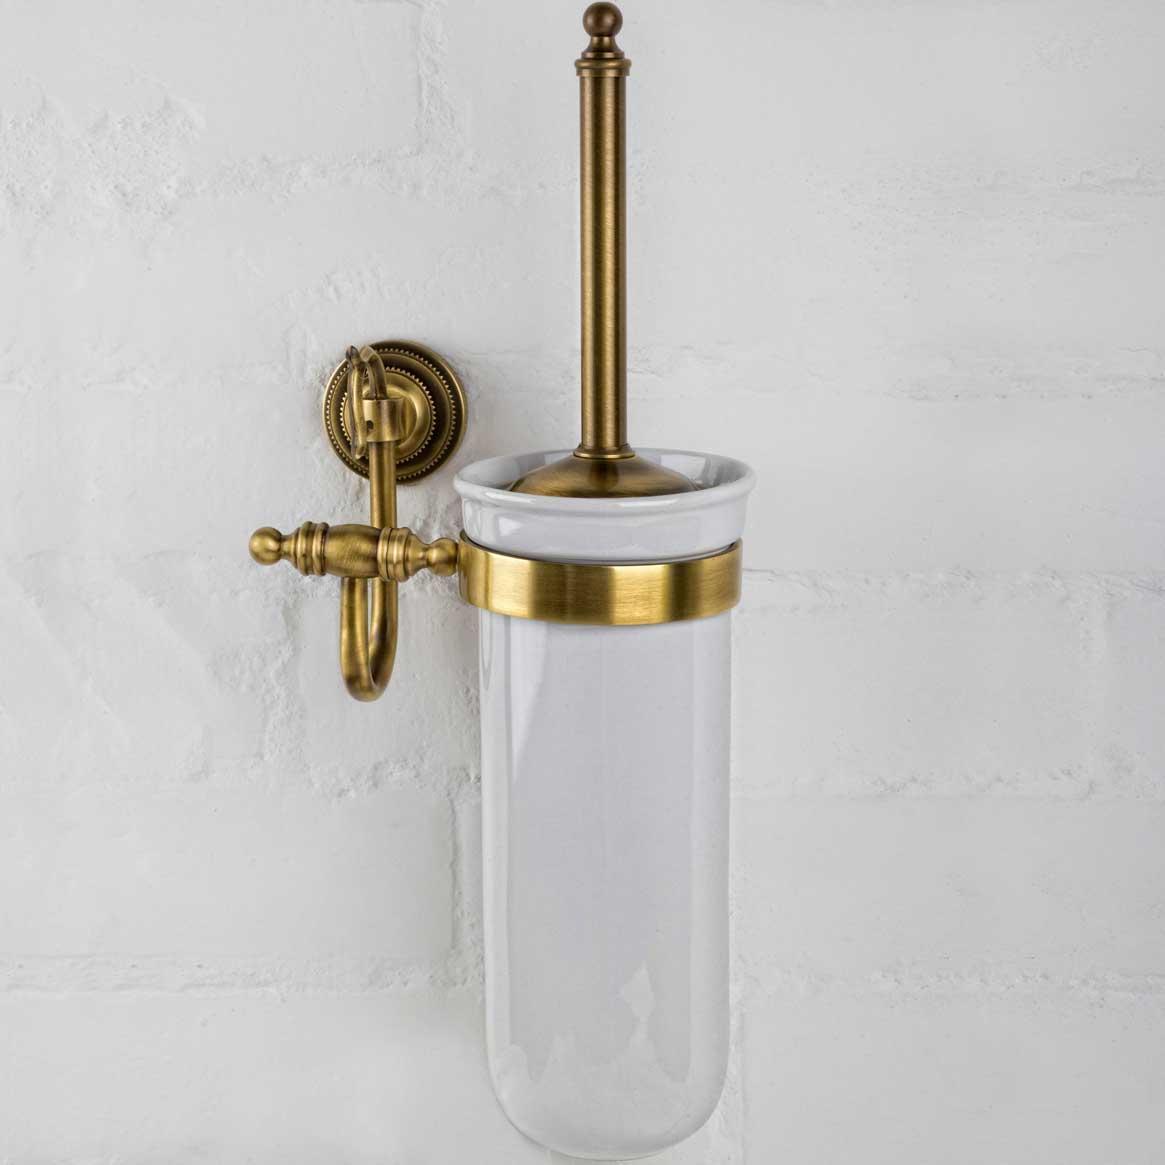 alis Туалетный ершик настенный Alis Versace V011K, бронза